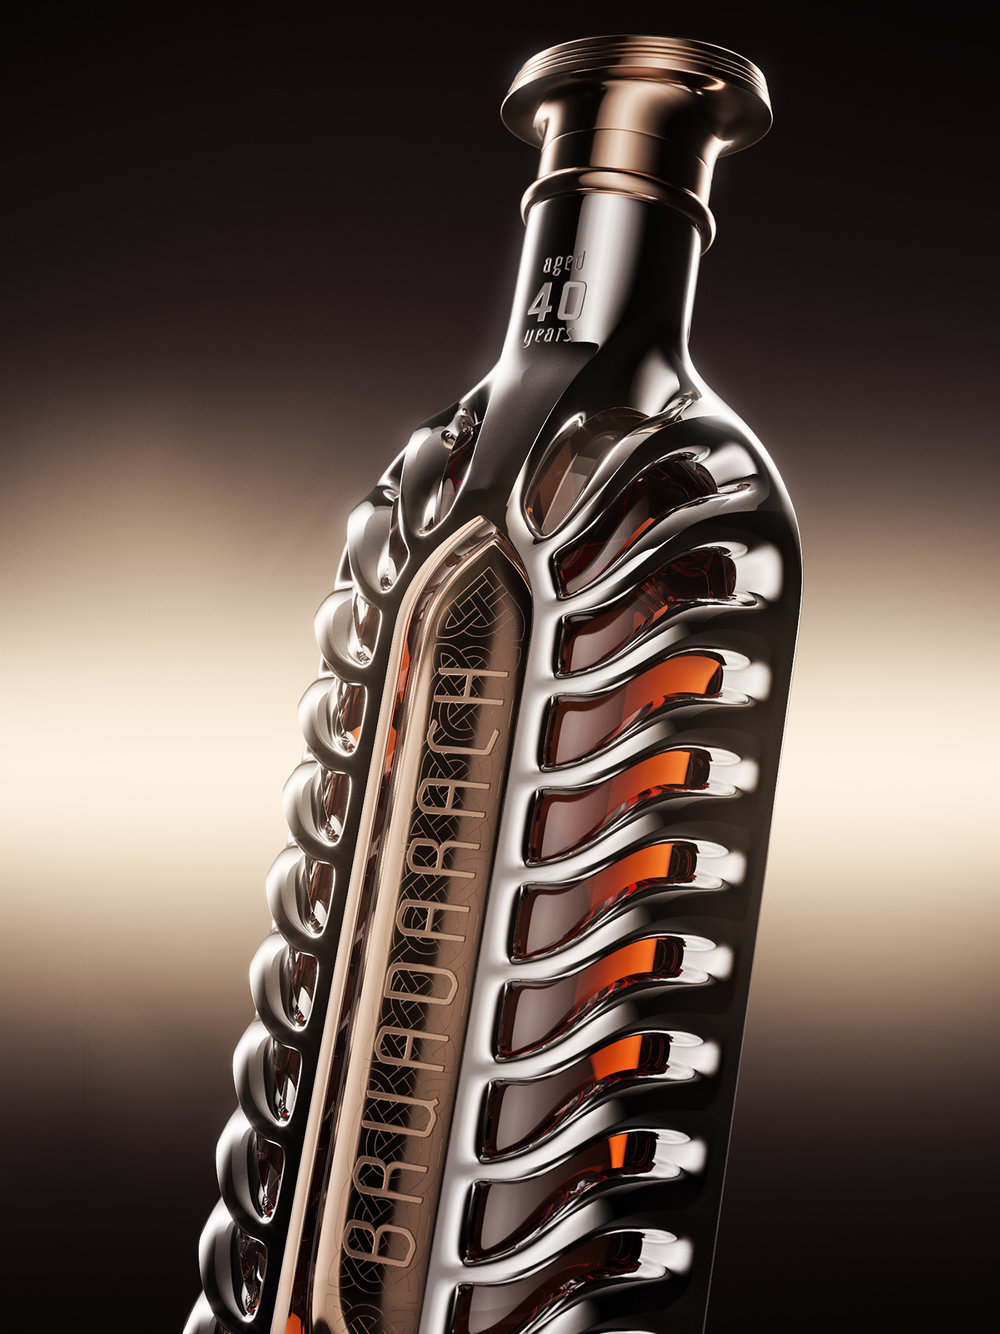 Luxury_whisky_glass_packaging_4.jpg